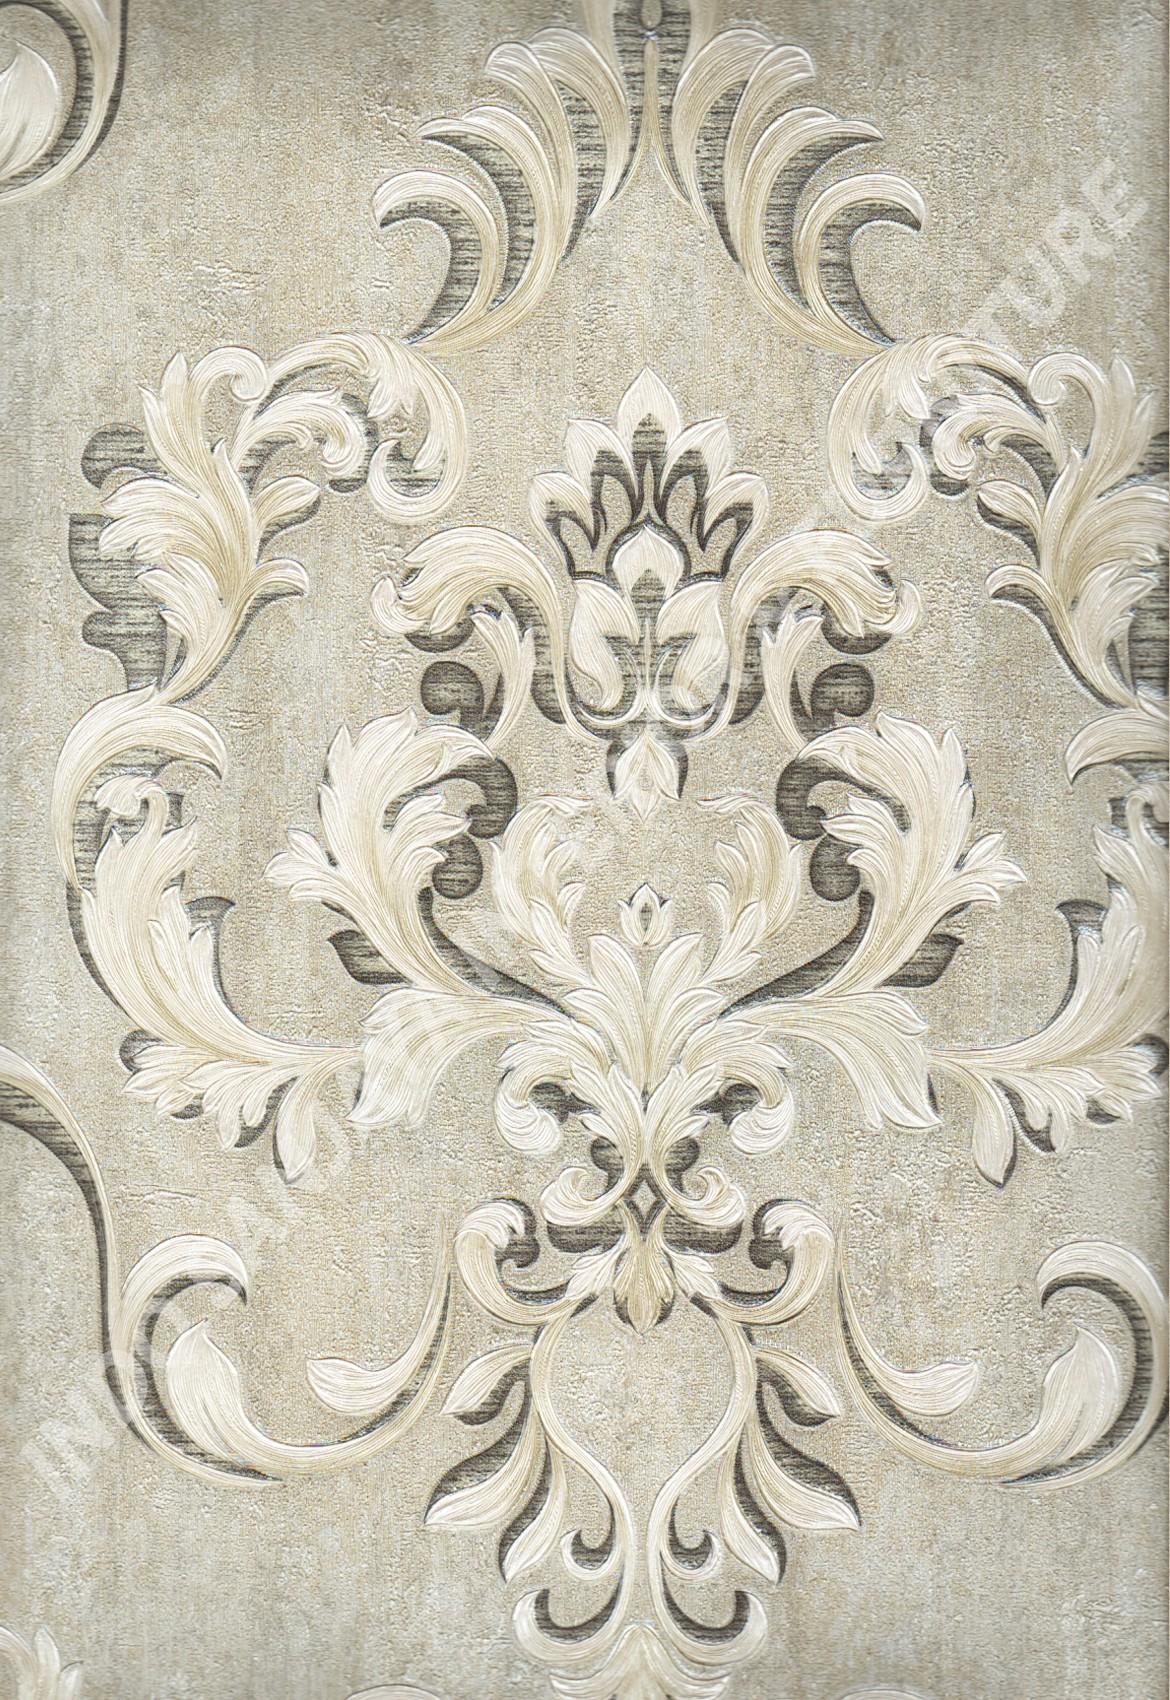 wallpaper   Wallpaper Klasik Batik (Damask) YG80501:YG80501 corak  warna